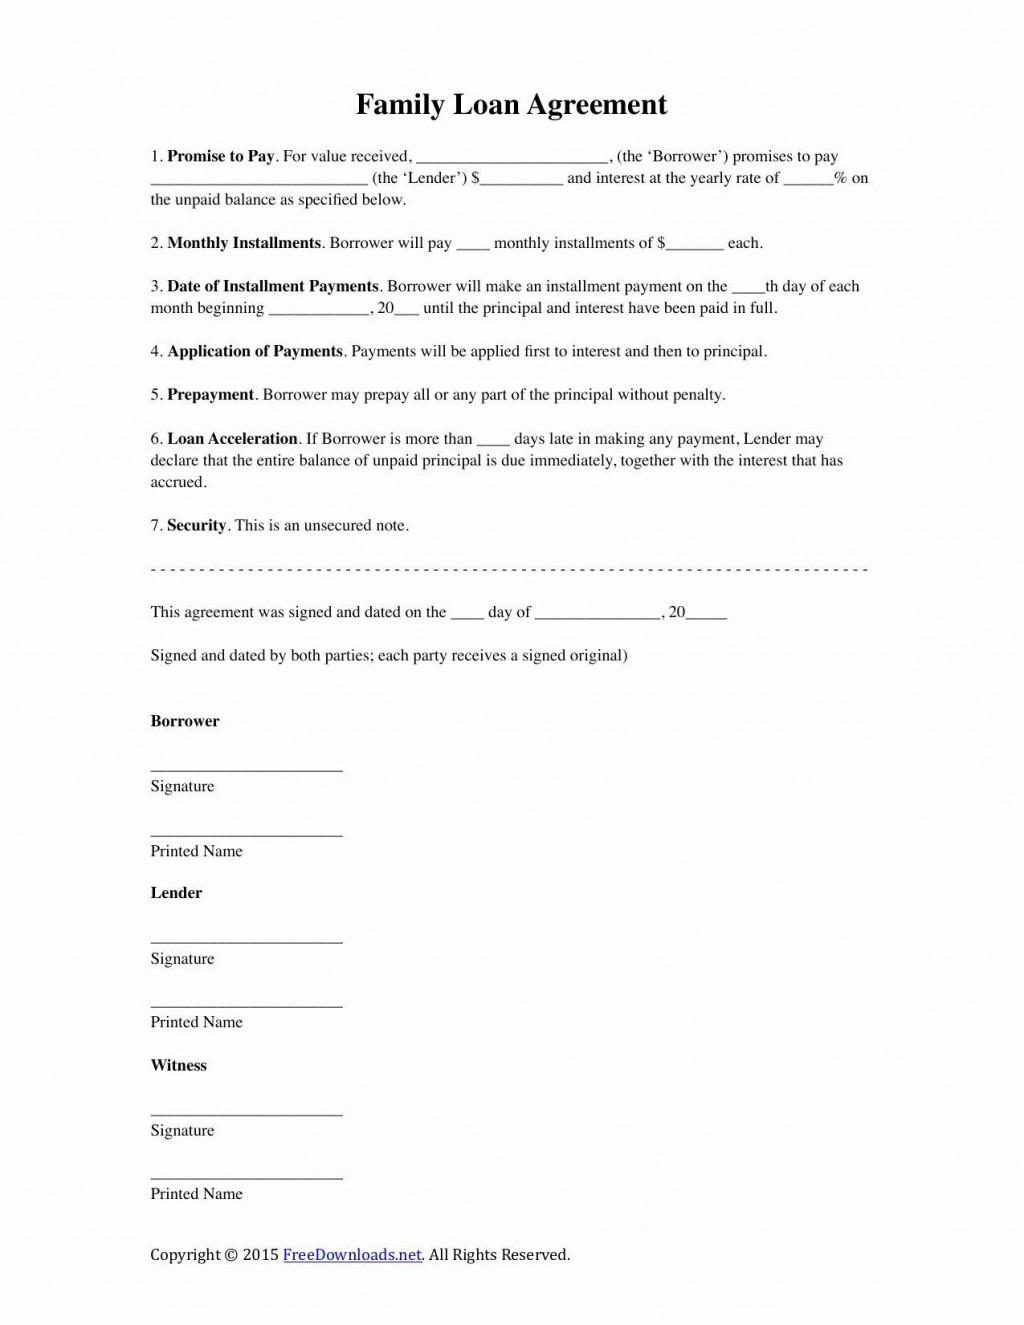 000 Frightening Family Loan Agreement Template Pdf Uk Image Large